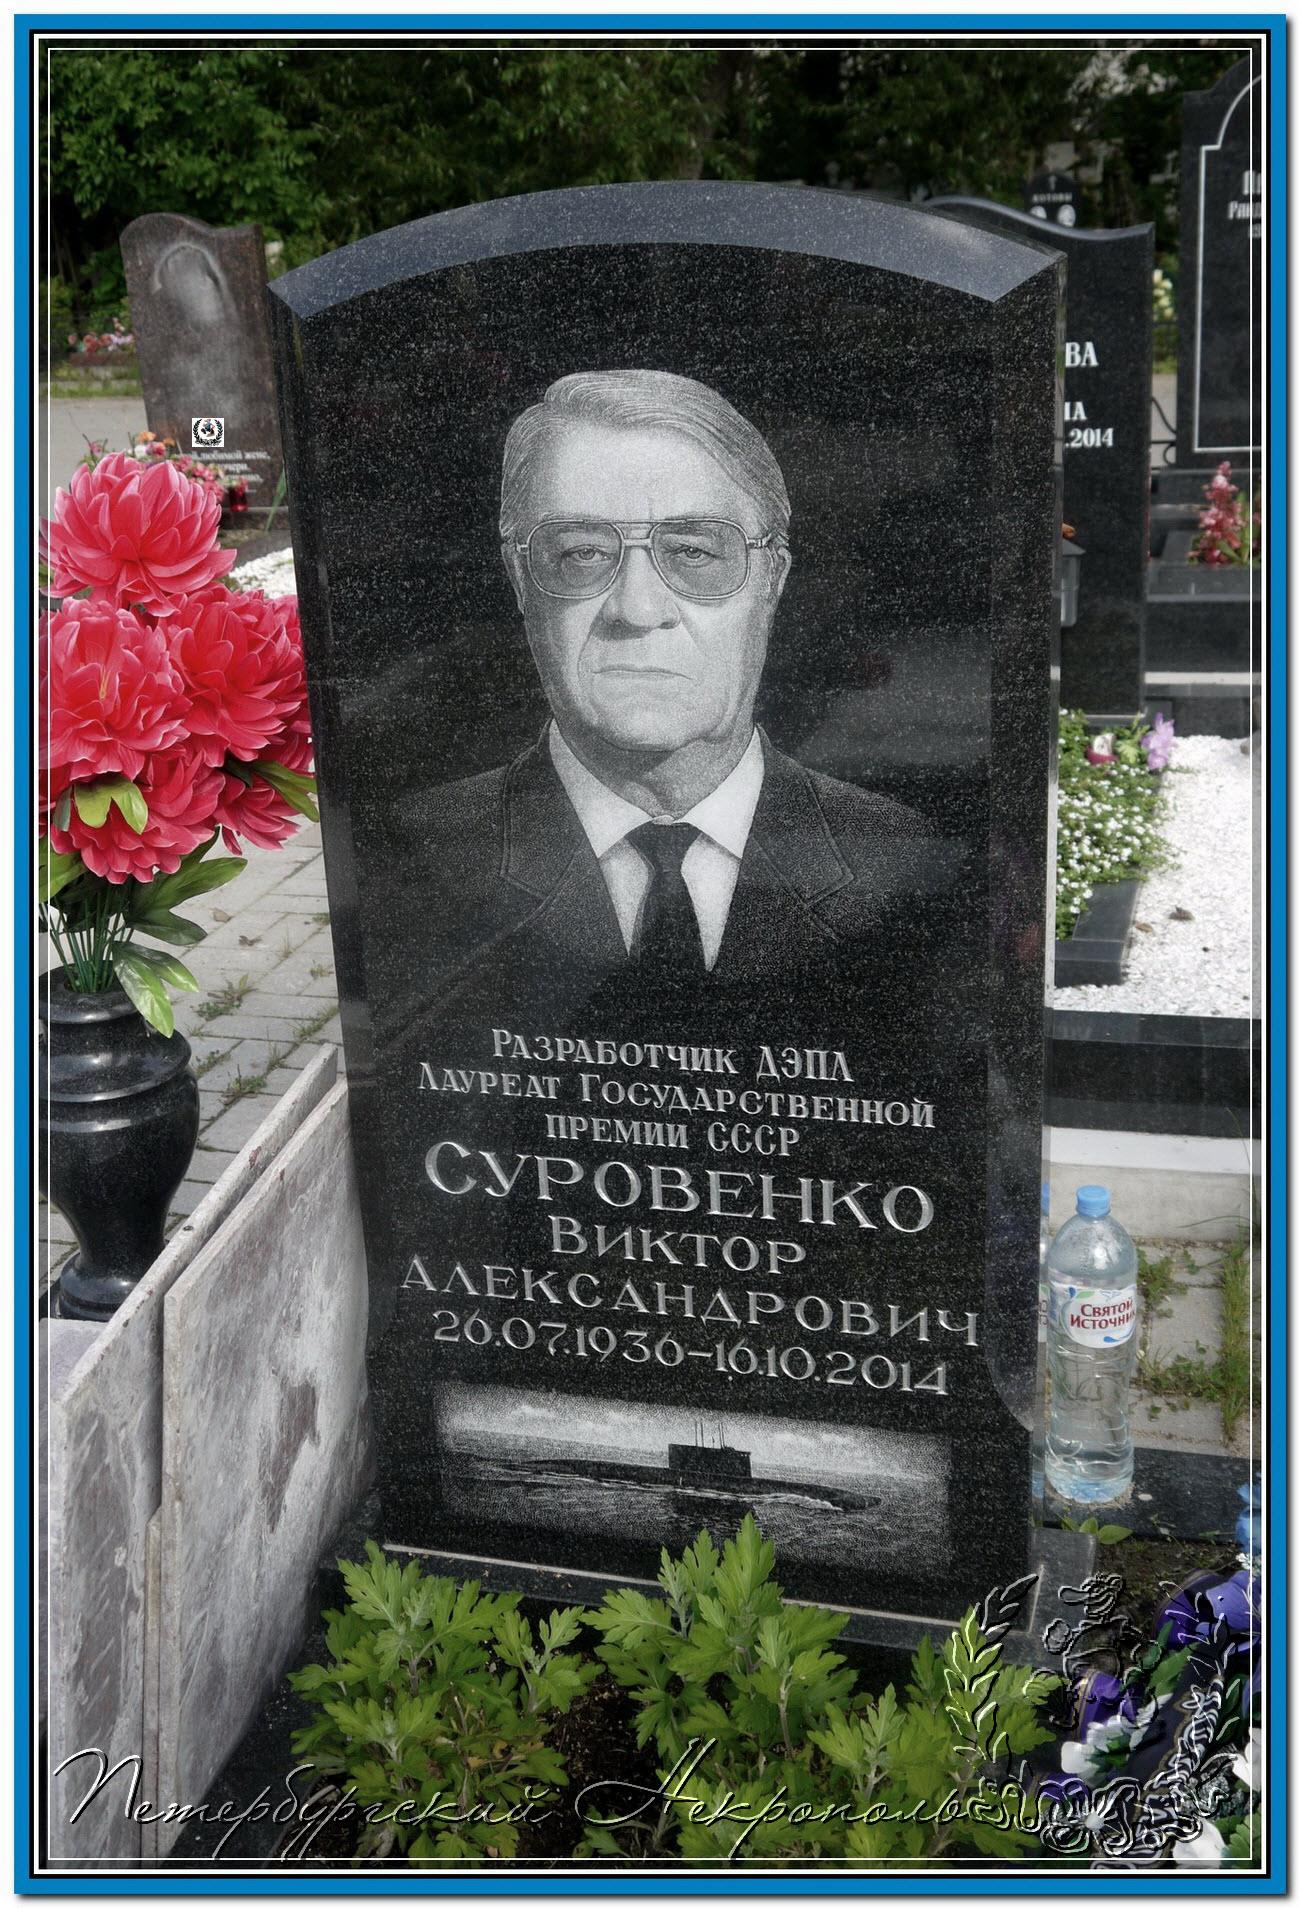 © Суровенко Виктор Александрович